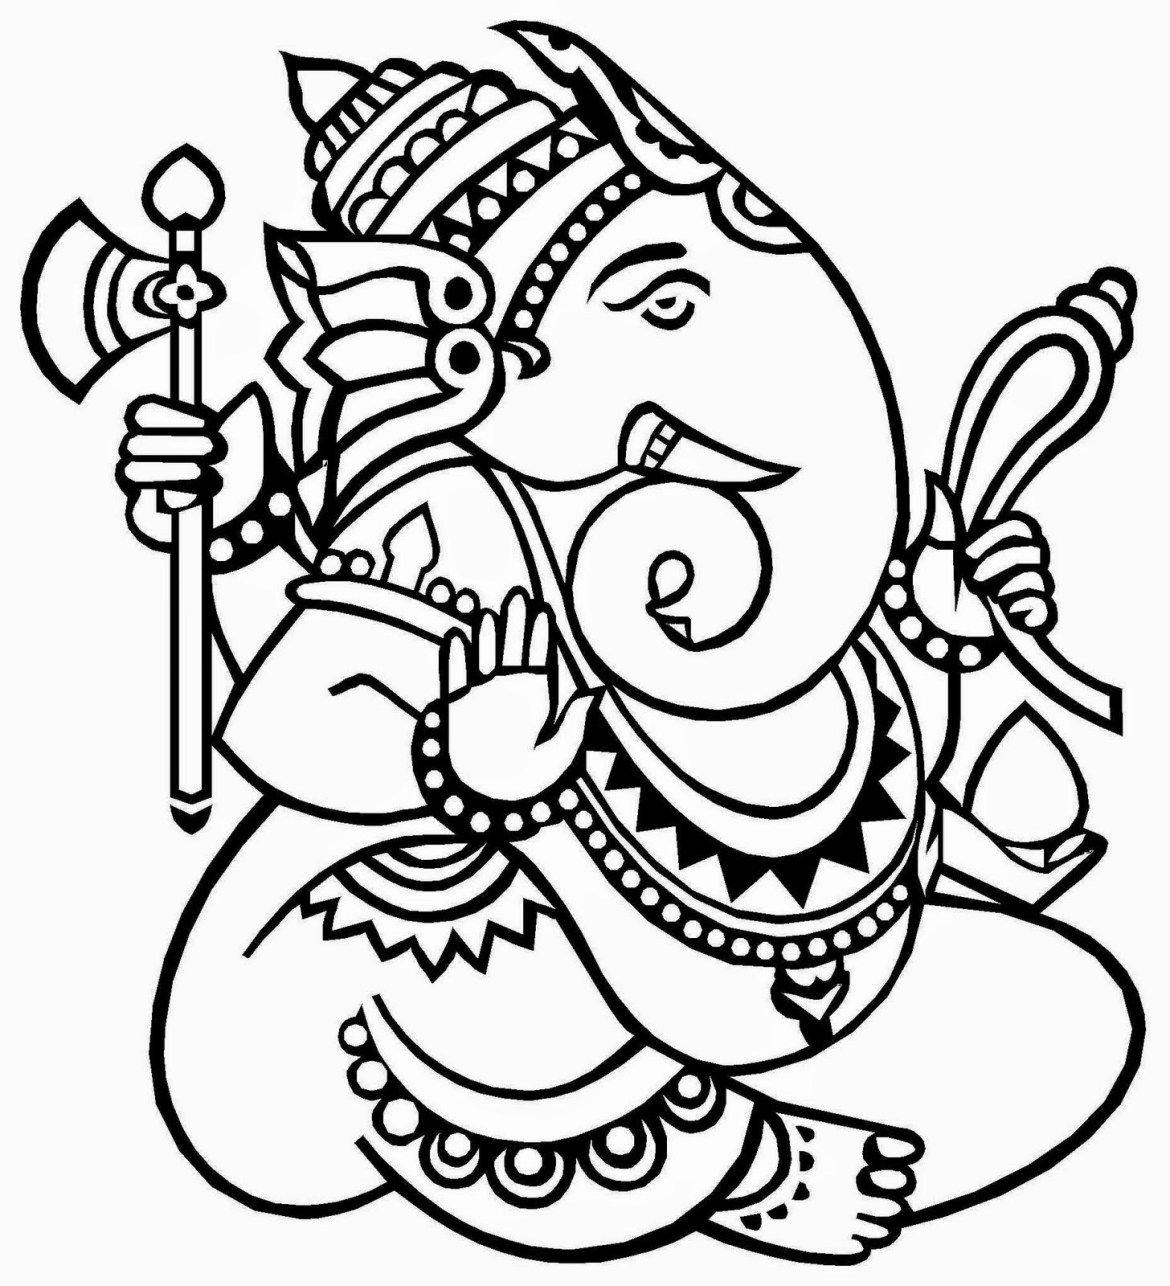 Lord Ganesha Free Coloring Pages For Kids Lord Ganesh Coloring Book Kerala Mural Painting Hindu Art Glass Painting Patterns